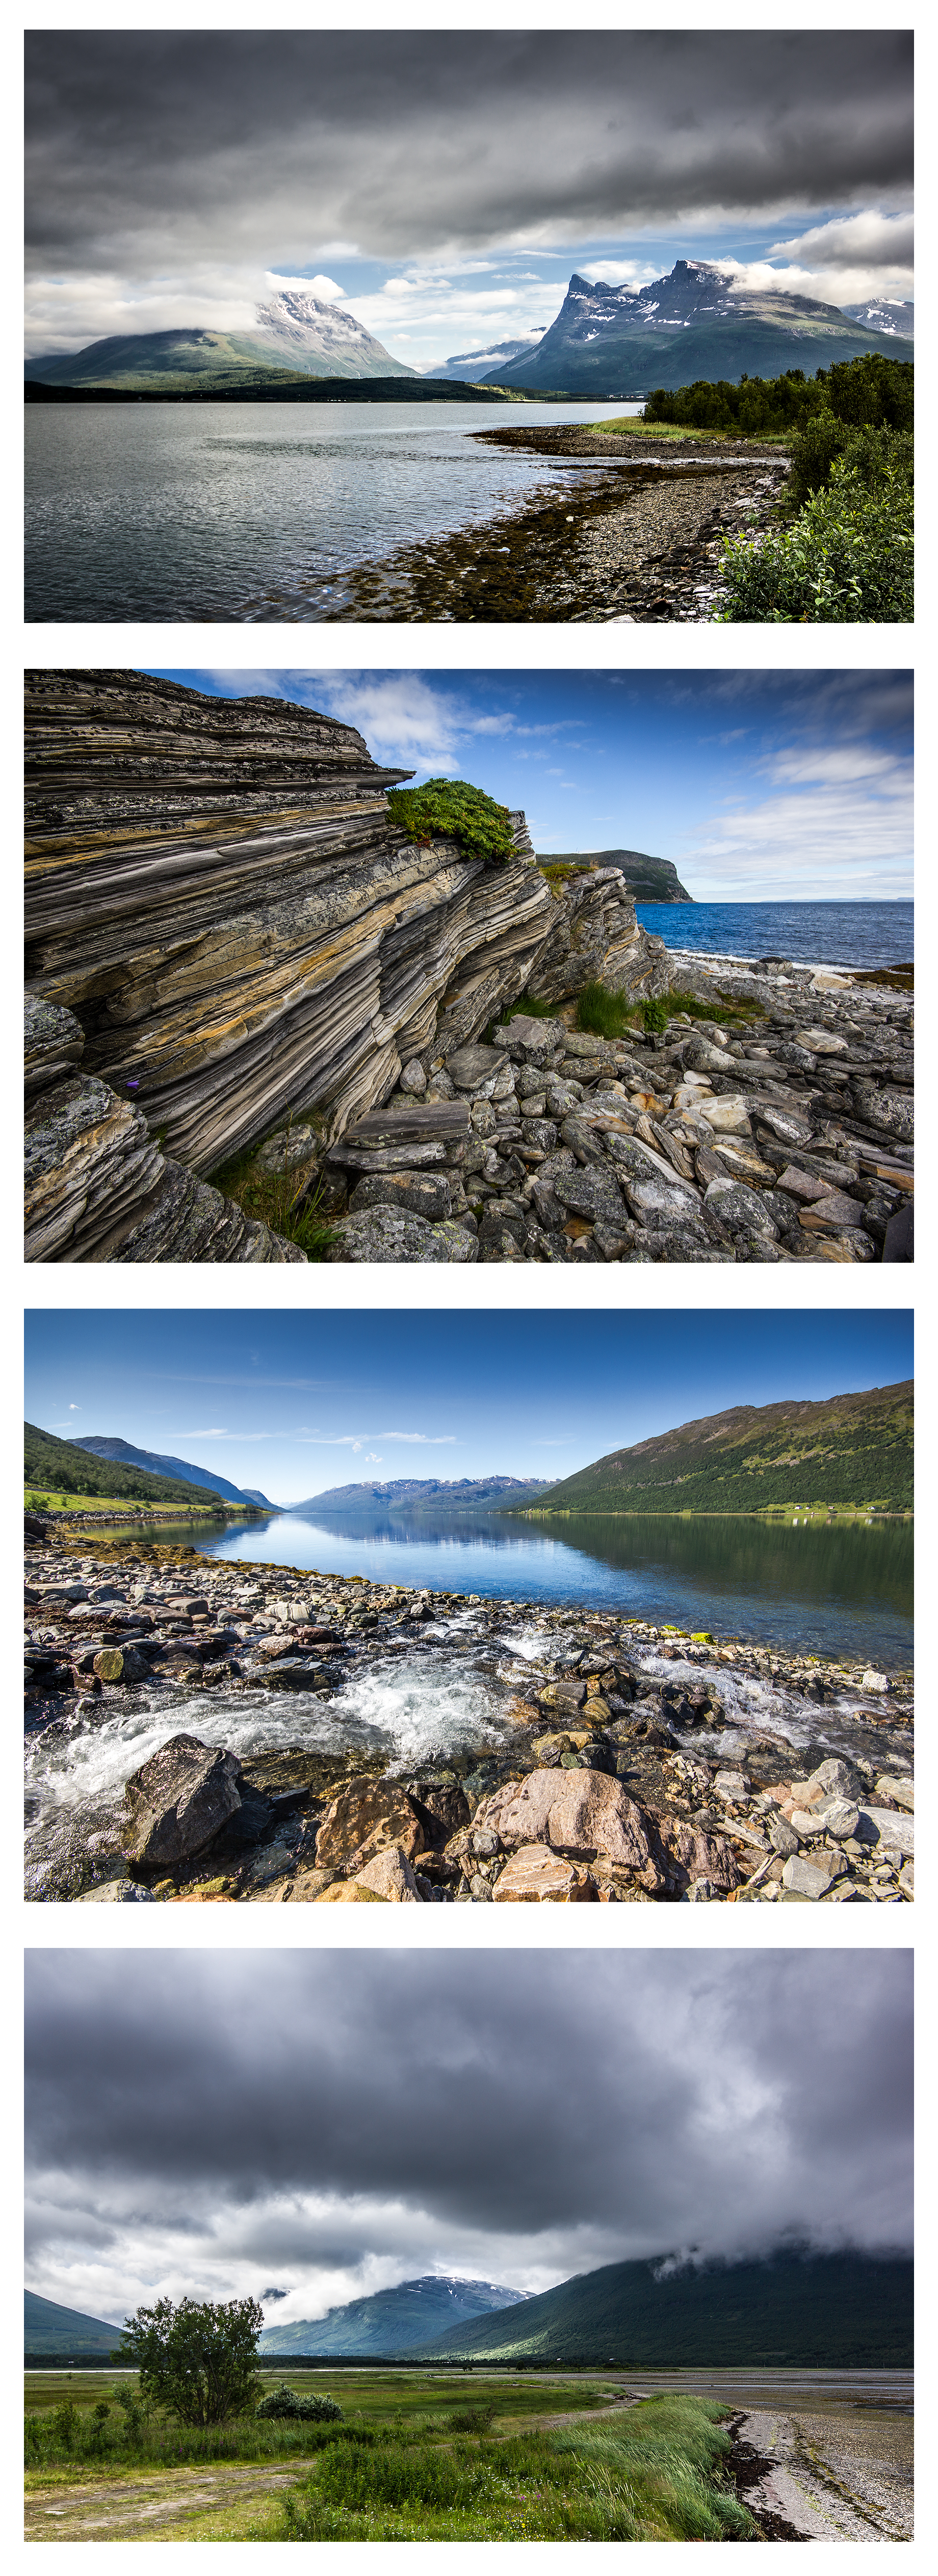 The Fjord Quadriptych by villekroger